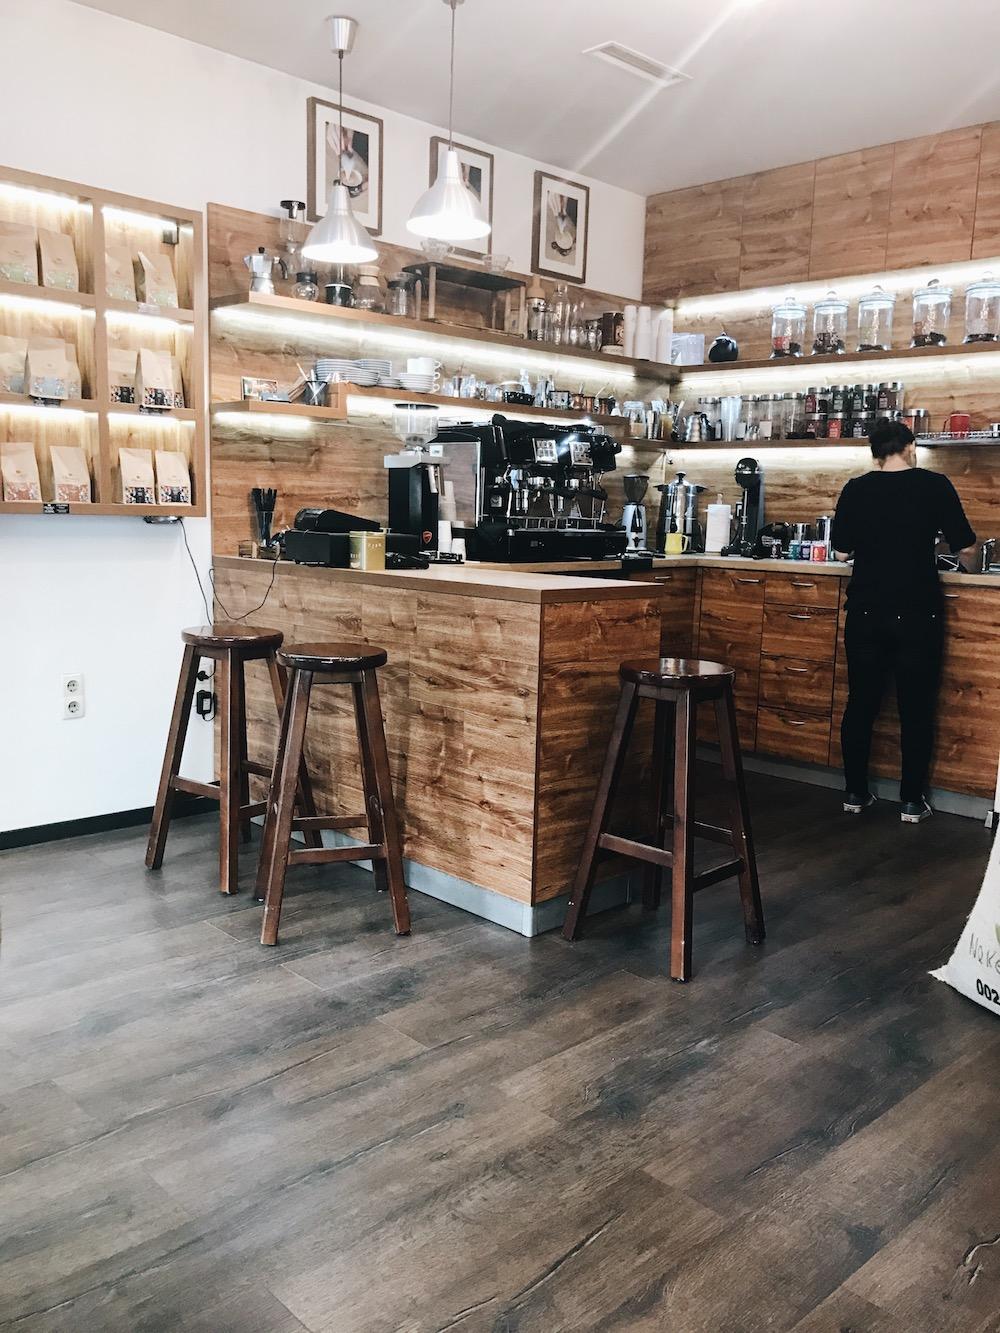 Chucky's Coffee House, Sofia, Bulgaria | Travel Guide by Ruby Josephine